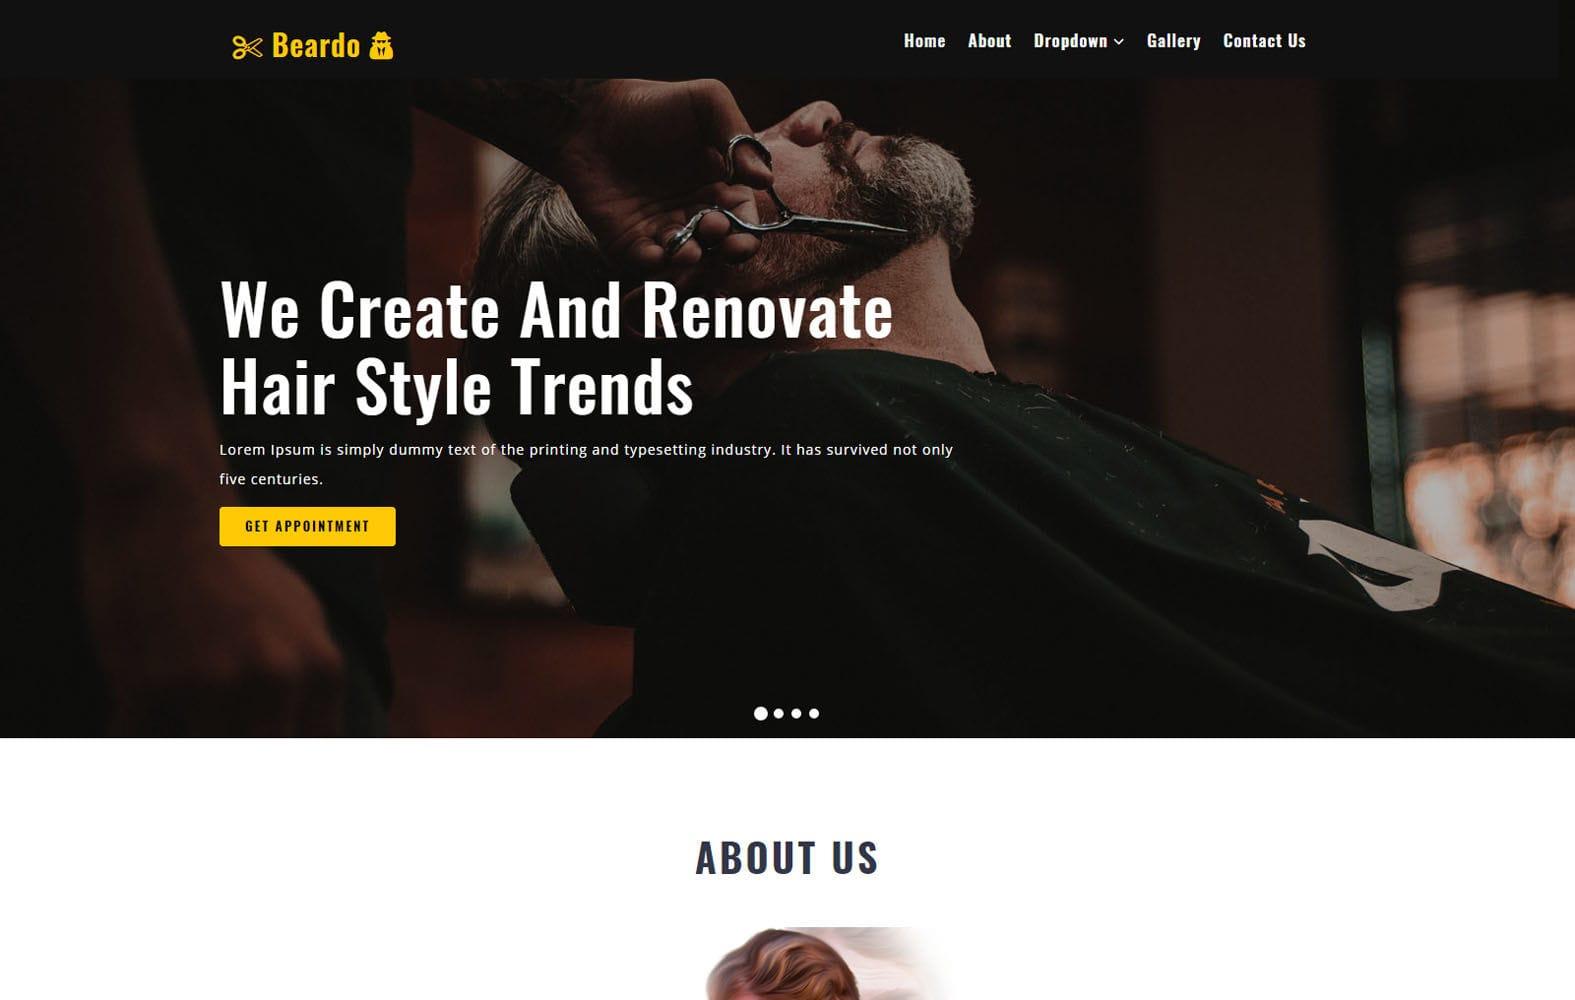 Beardo a Beauty Category Bootstrap Responsive Web Template Mobile website template Free